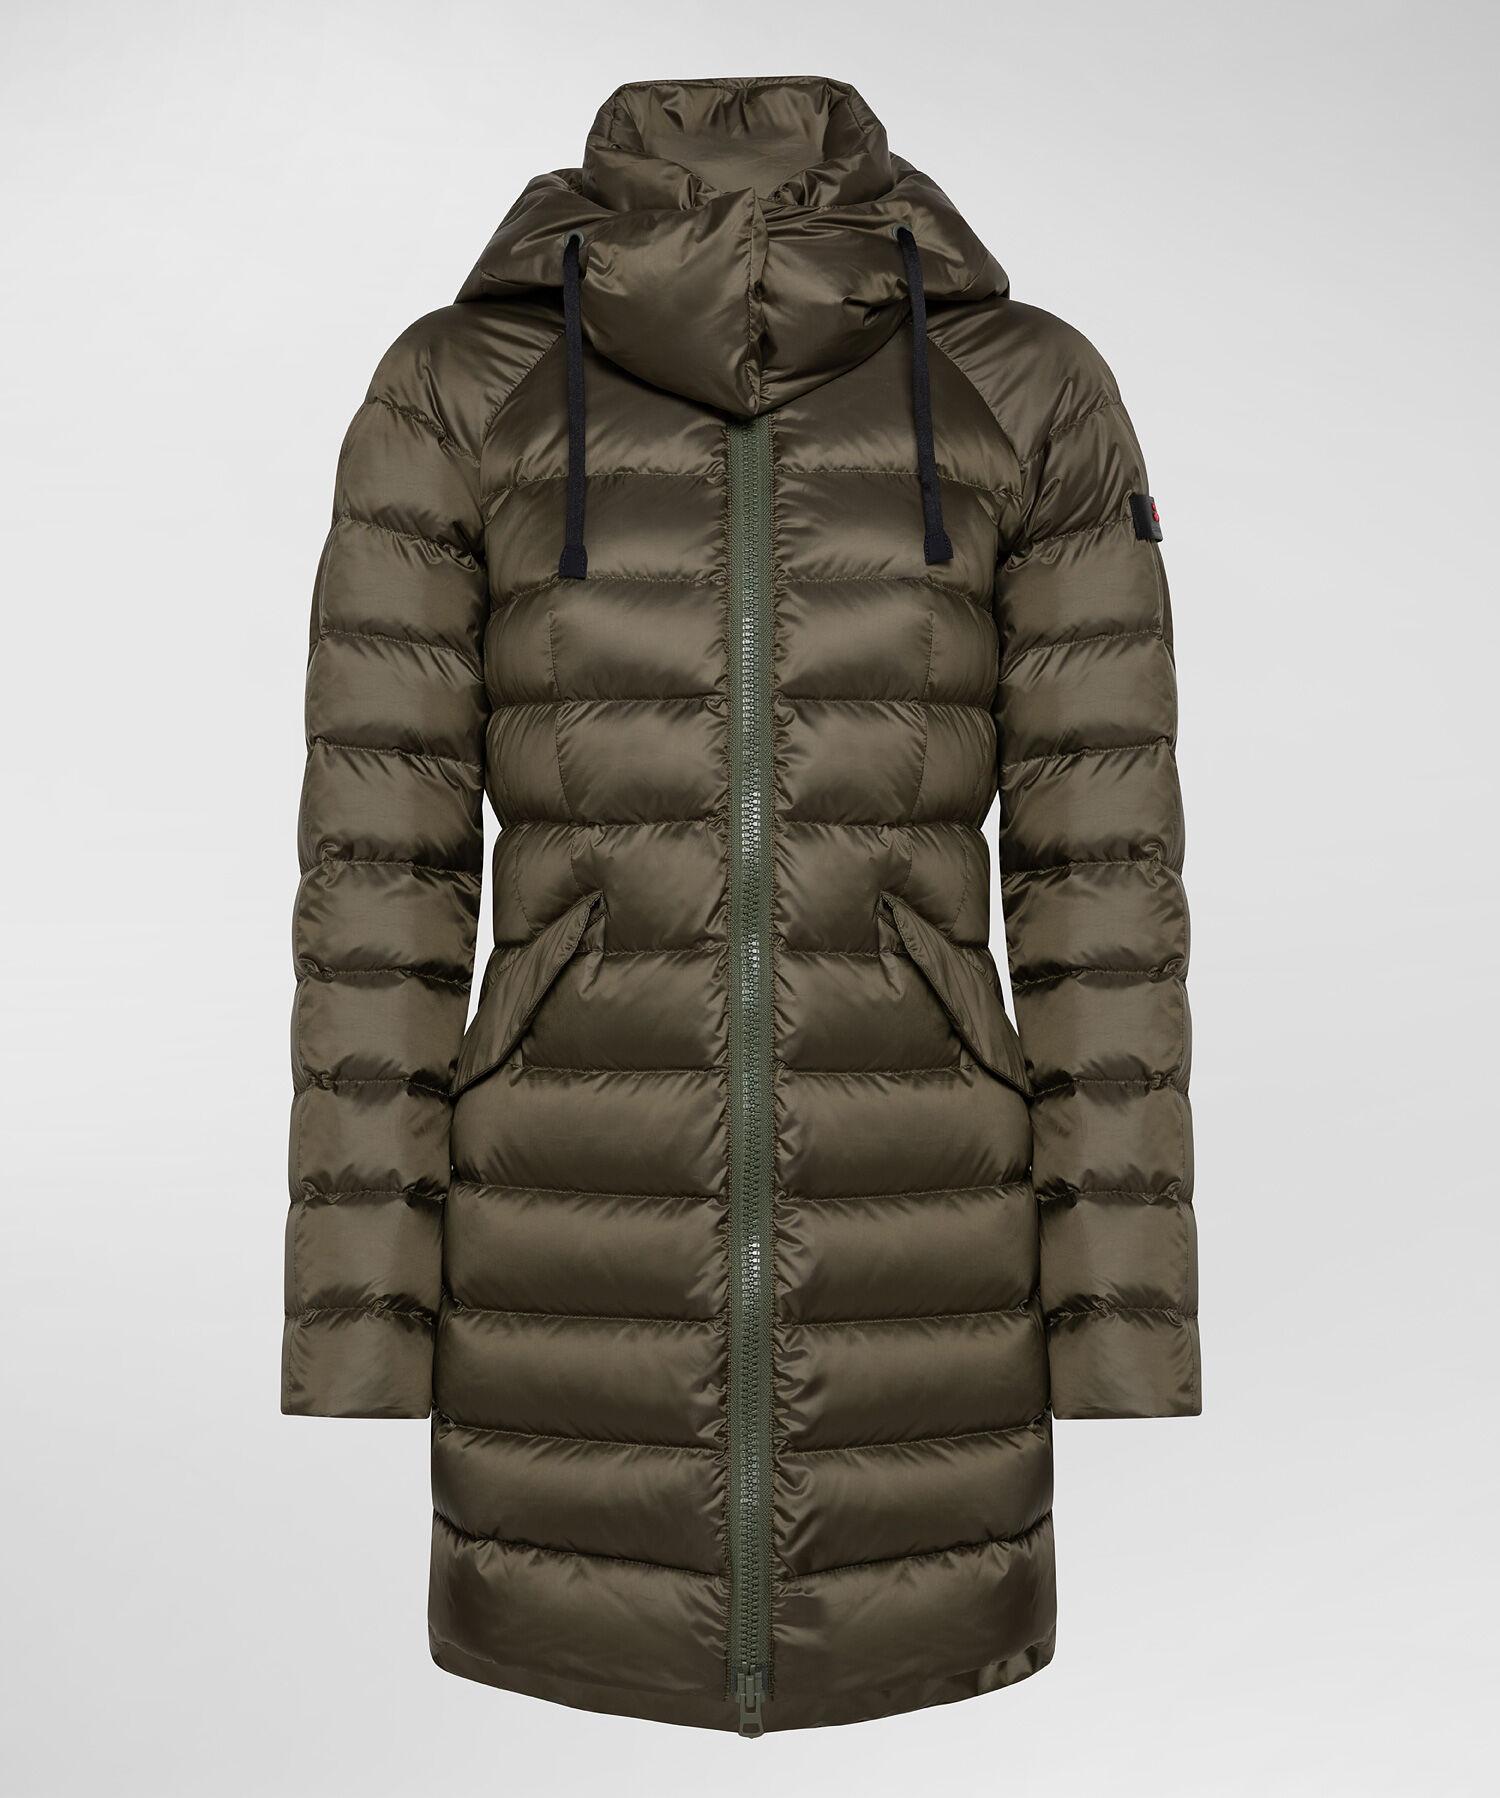 Puffed Jacket Superlight - Peuterey